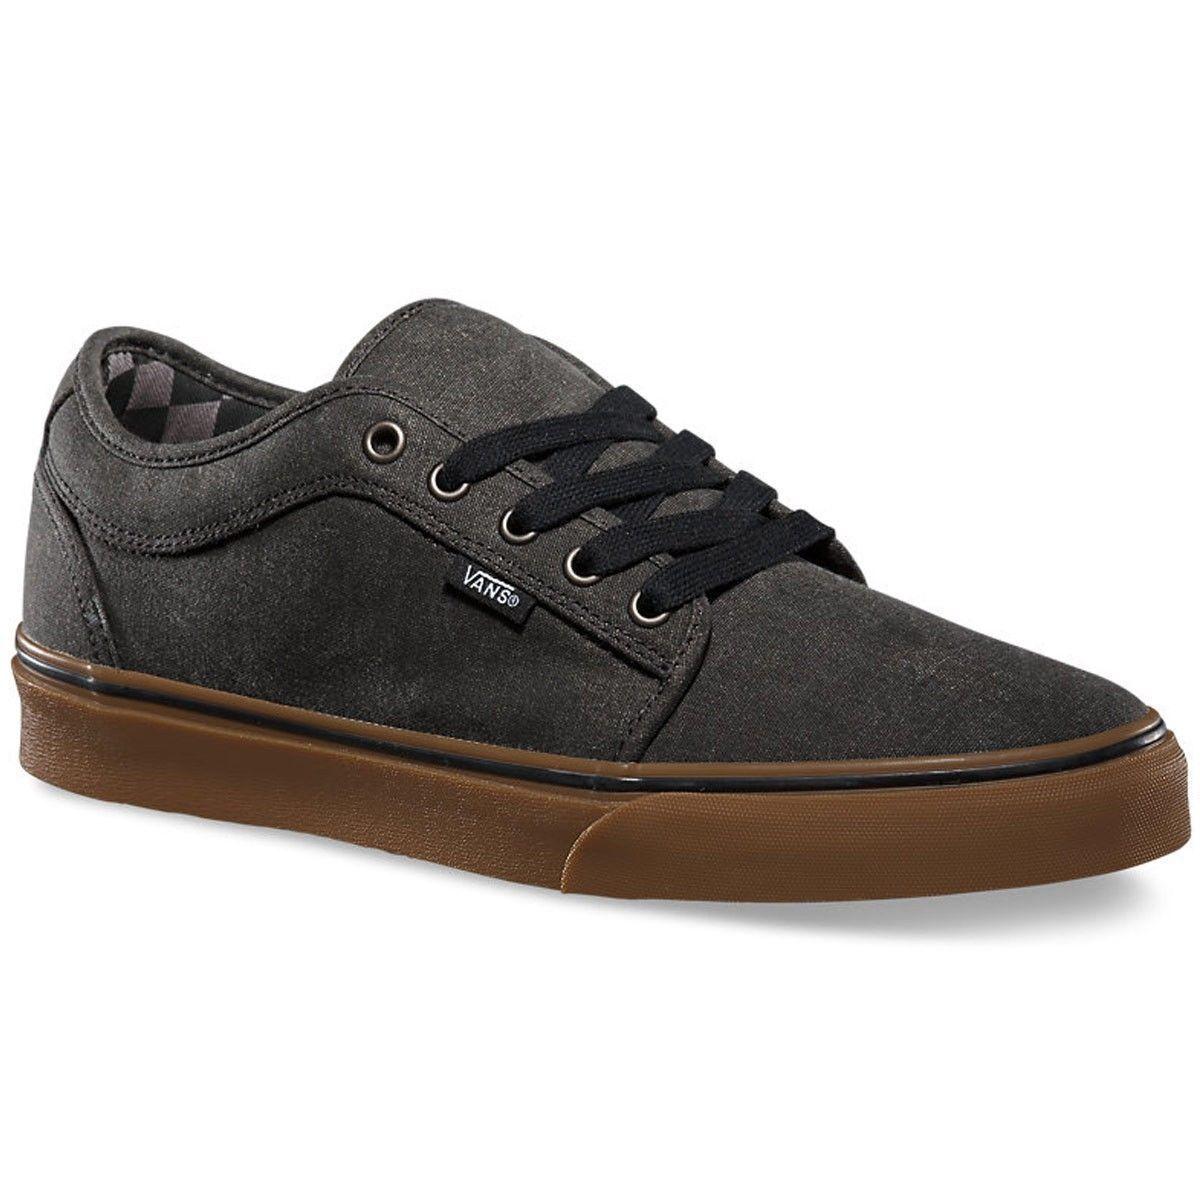 VANS Chukka Low 6.5 (Washed) Black/Gum Classic Skate Shoes MEN'S 6.5 Low WOMEN'S 8 29714b